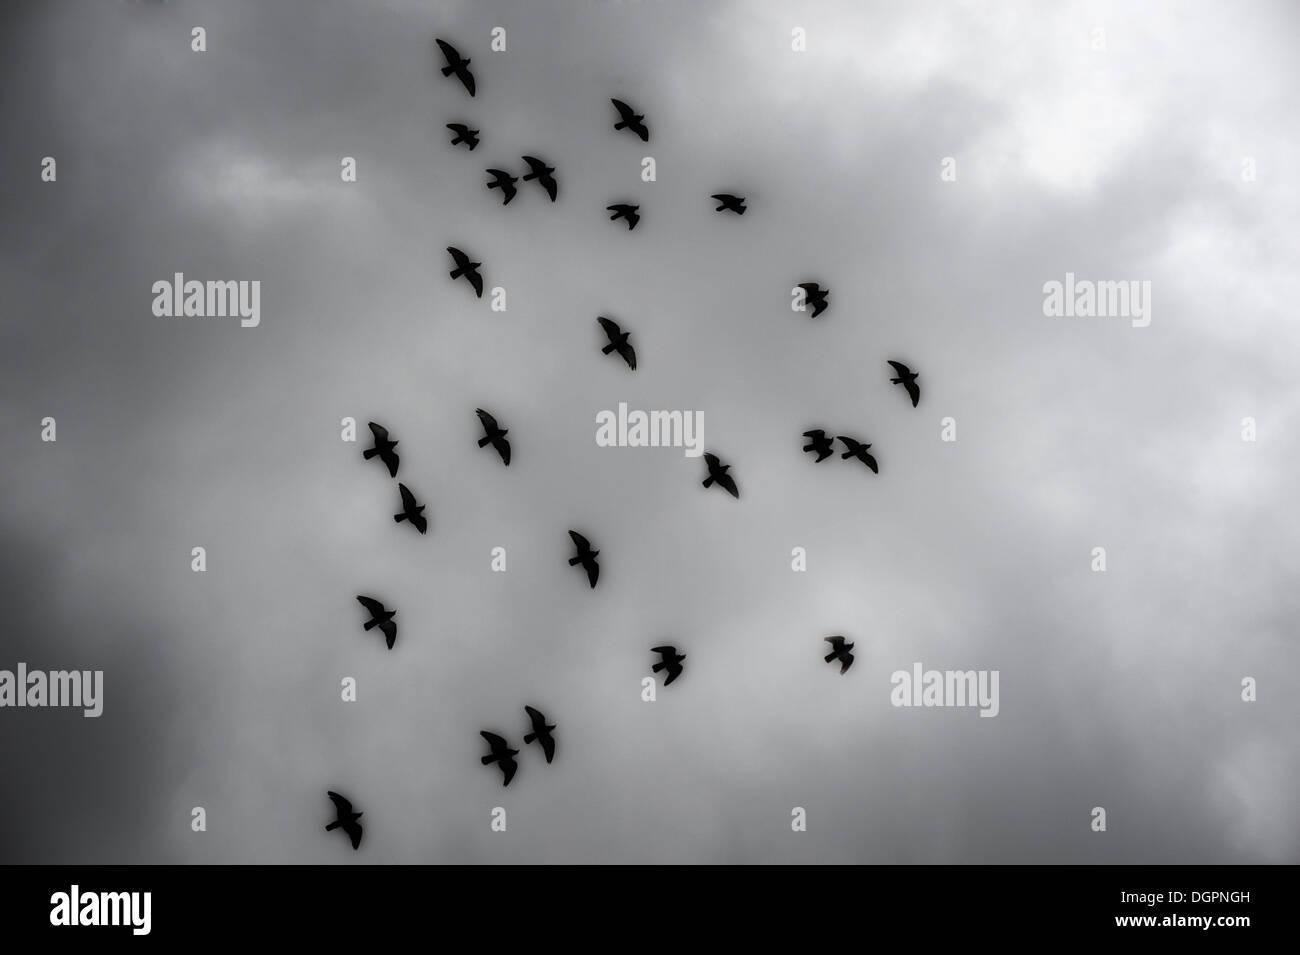 Dark Black Birds Flying In Stormy Cloudy Sky - Stock Image